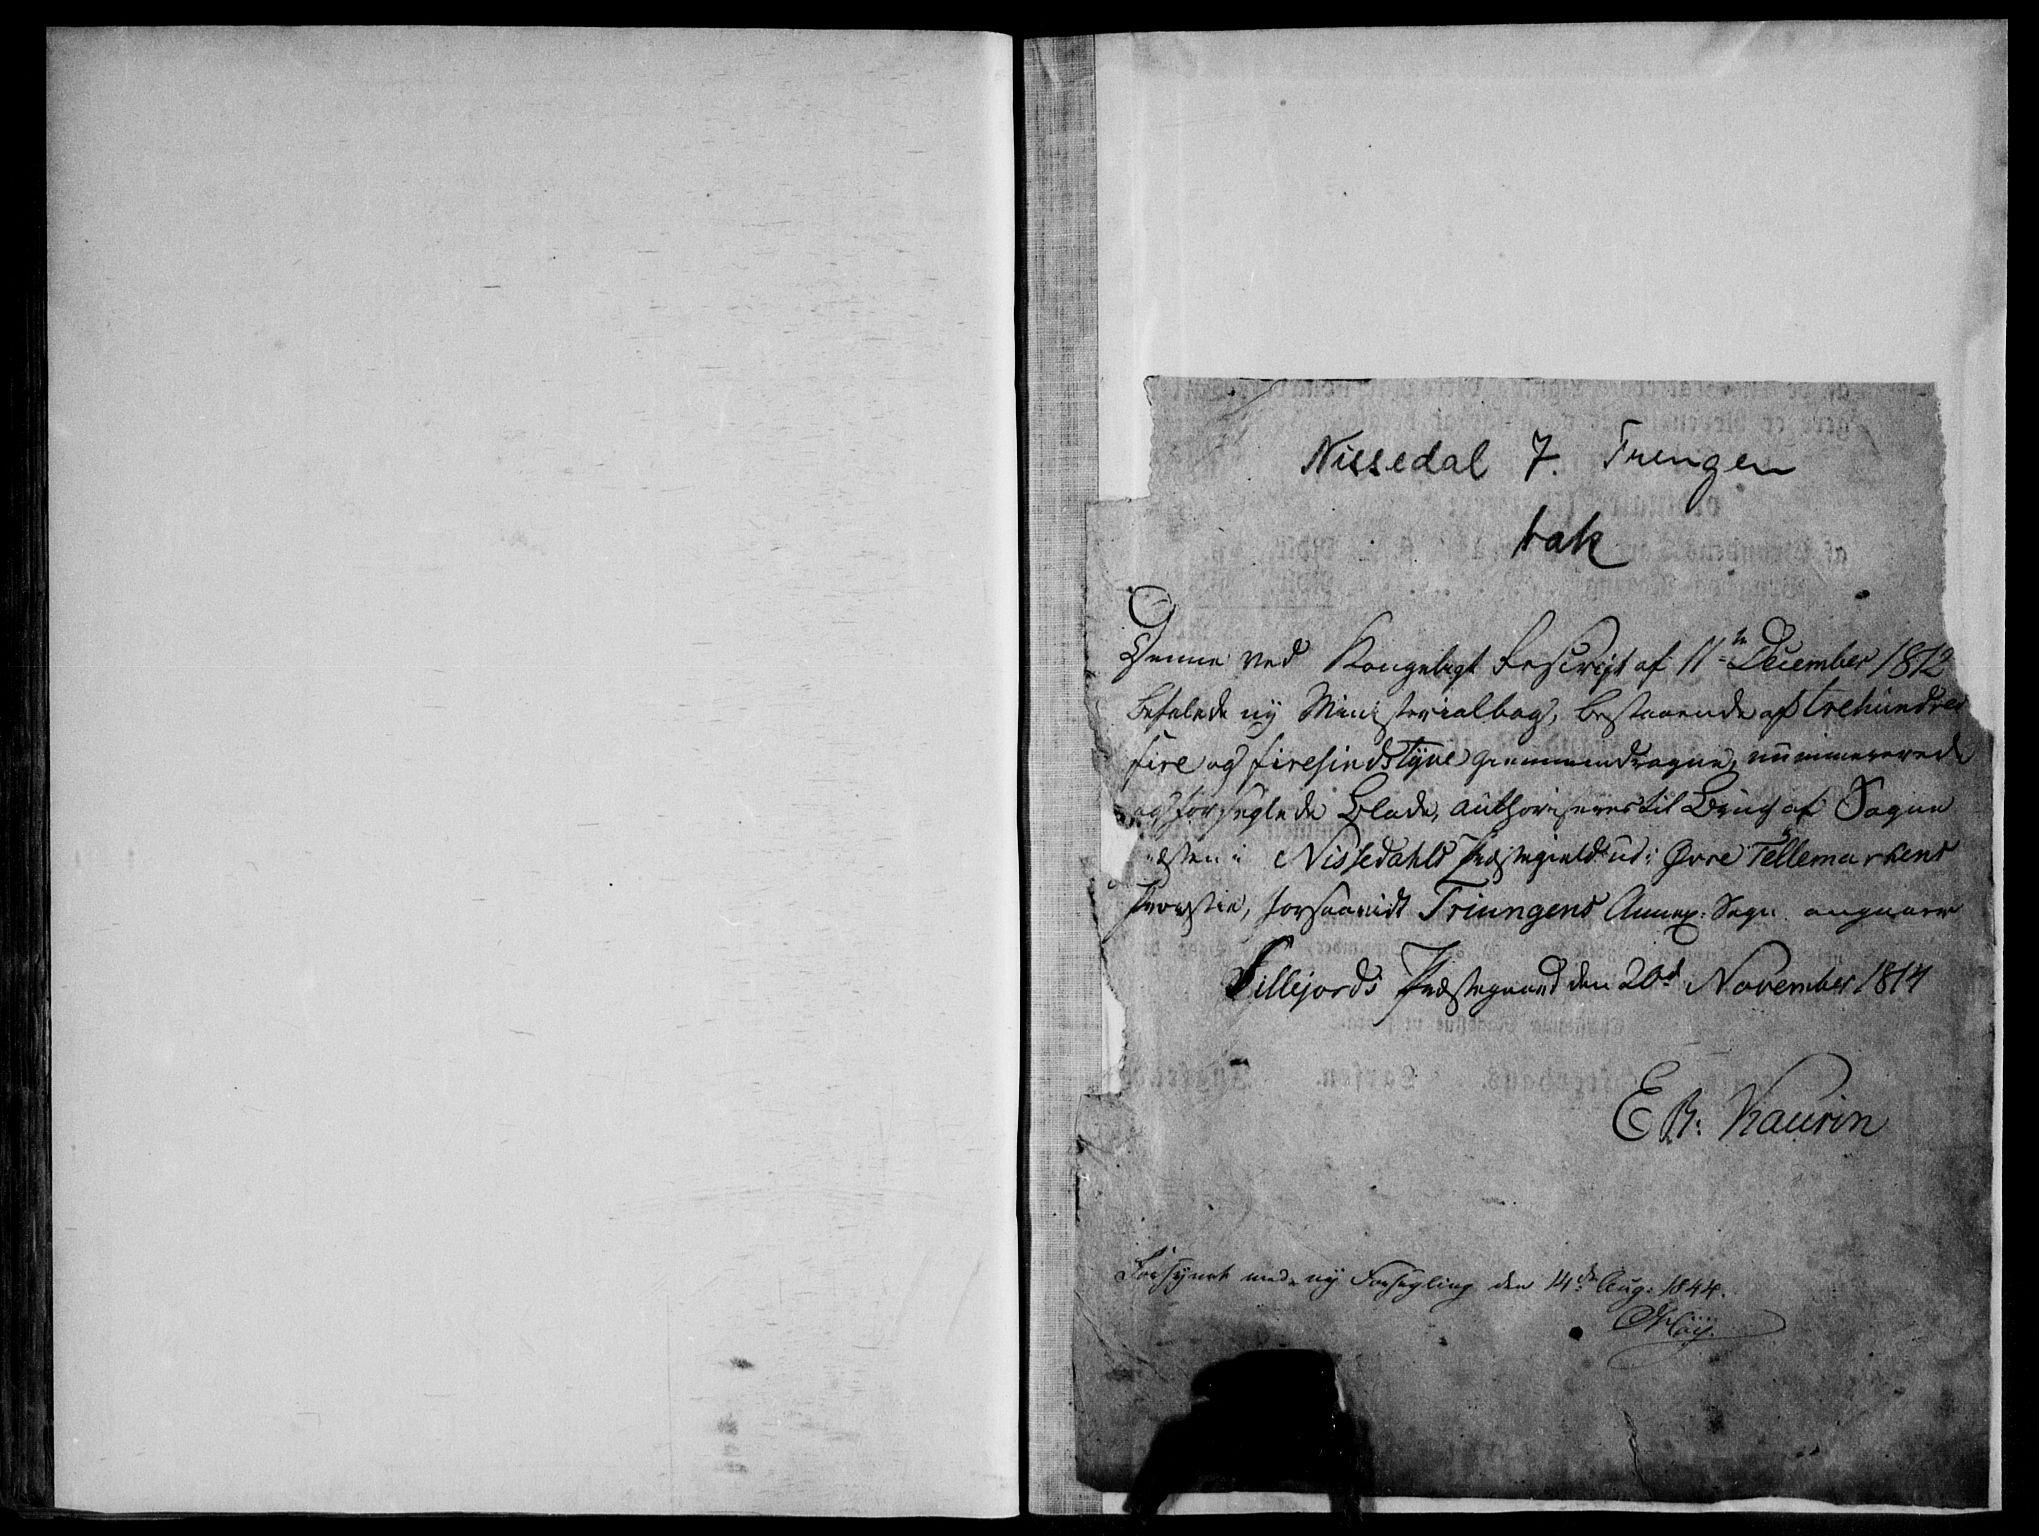 SAKO, Nissedal kirkebøker, F/Fb/L0001: Ministerialbok nr. II 1, 1814-1845